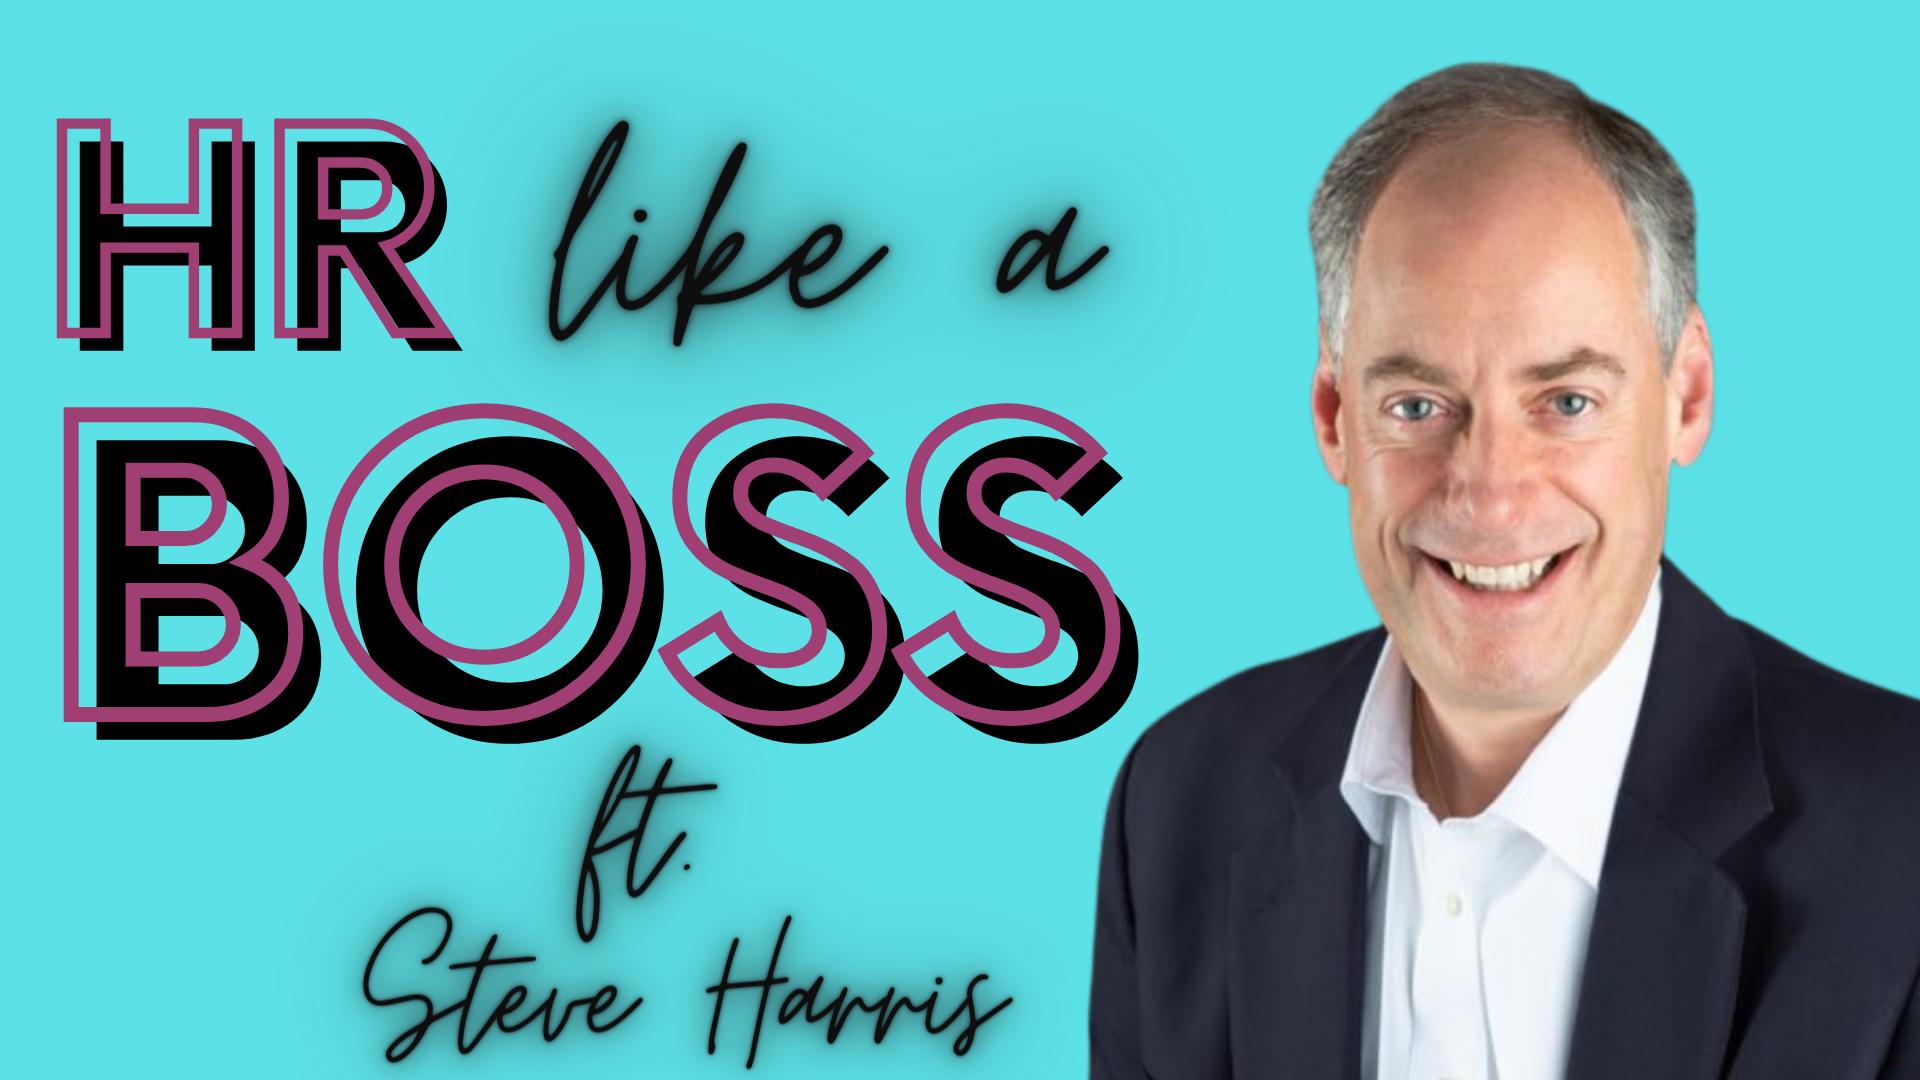 HR Like a Boss with Steve Harris